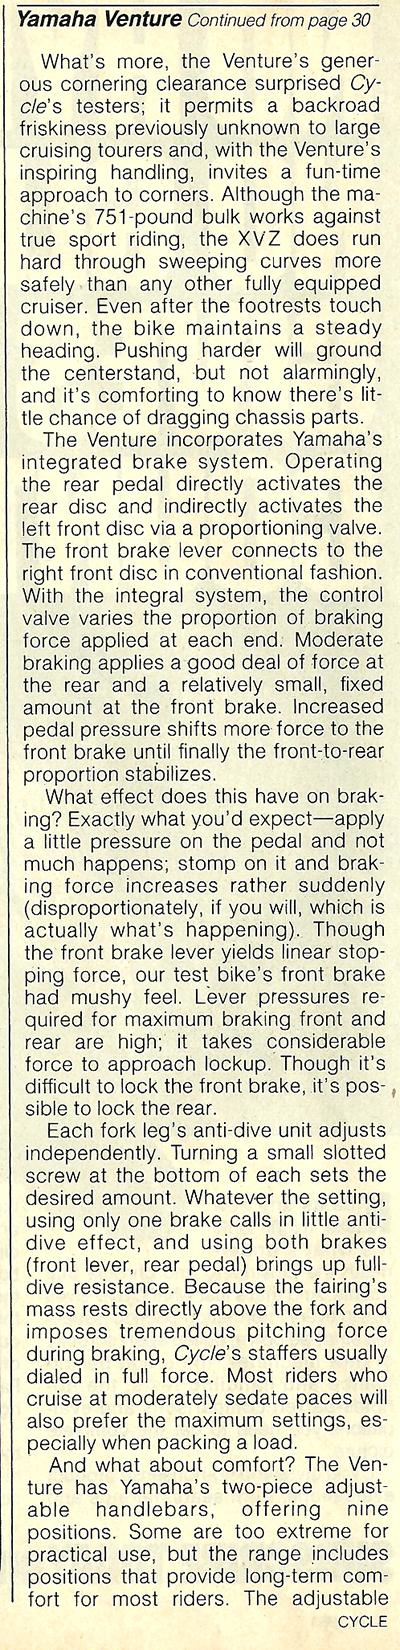 1983 Yamaha XVZ12TK Venture road test 09.jpg